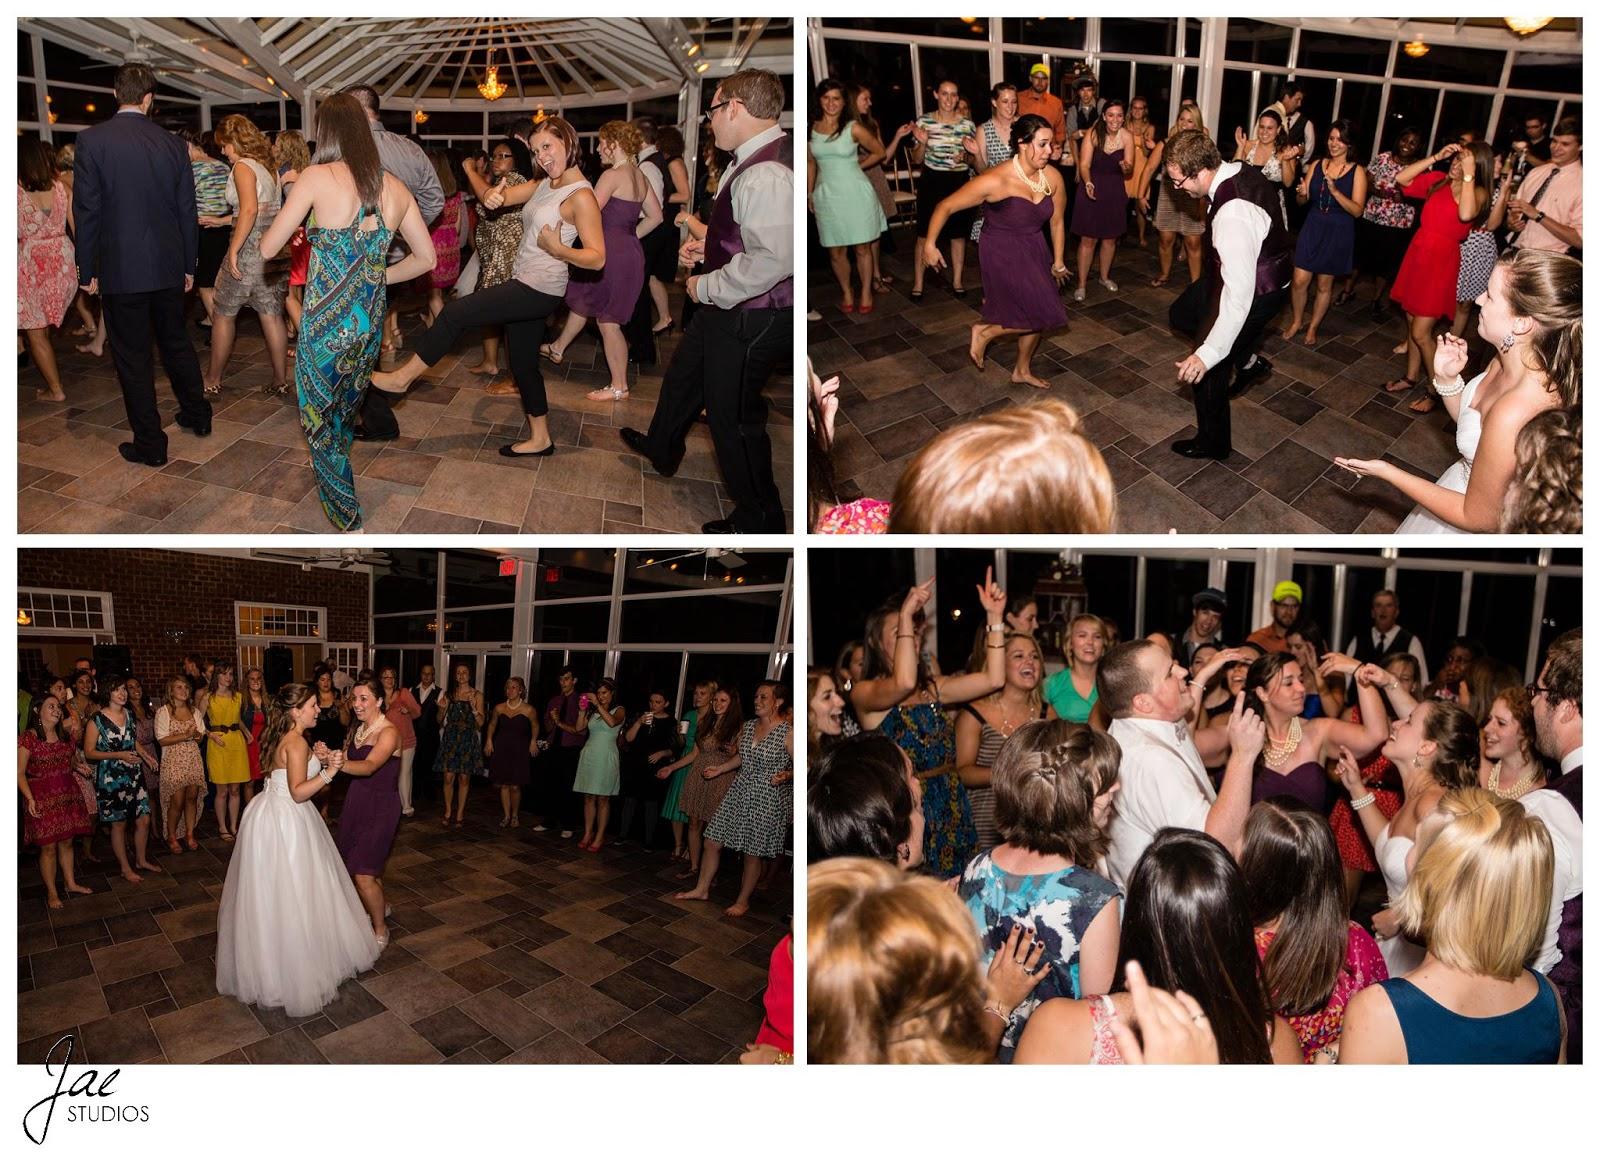 Jonathan and Julie, Bird cage, West Manor Estate, Wedding, Lynchburg, Virginia, Jae Studios, dancing, reception, guests, bridesmaids, wedding party, wedding dress, bride, groom